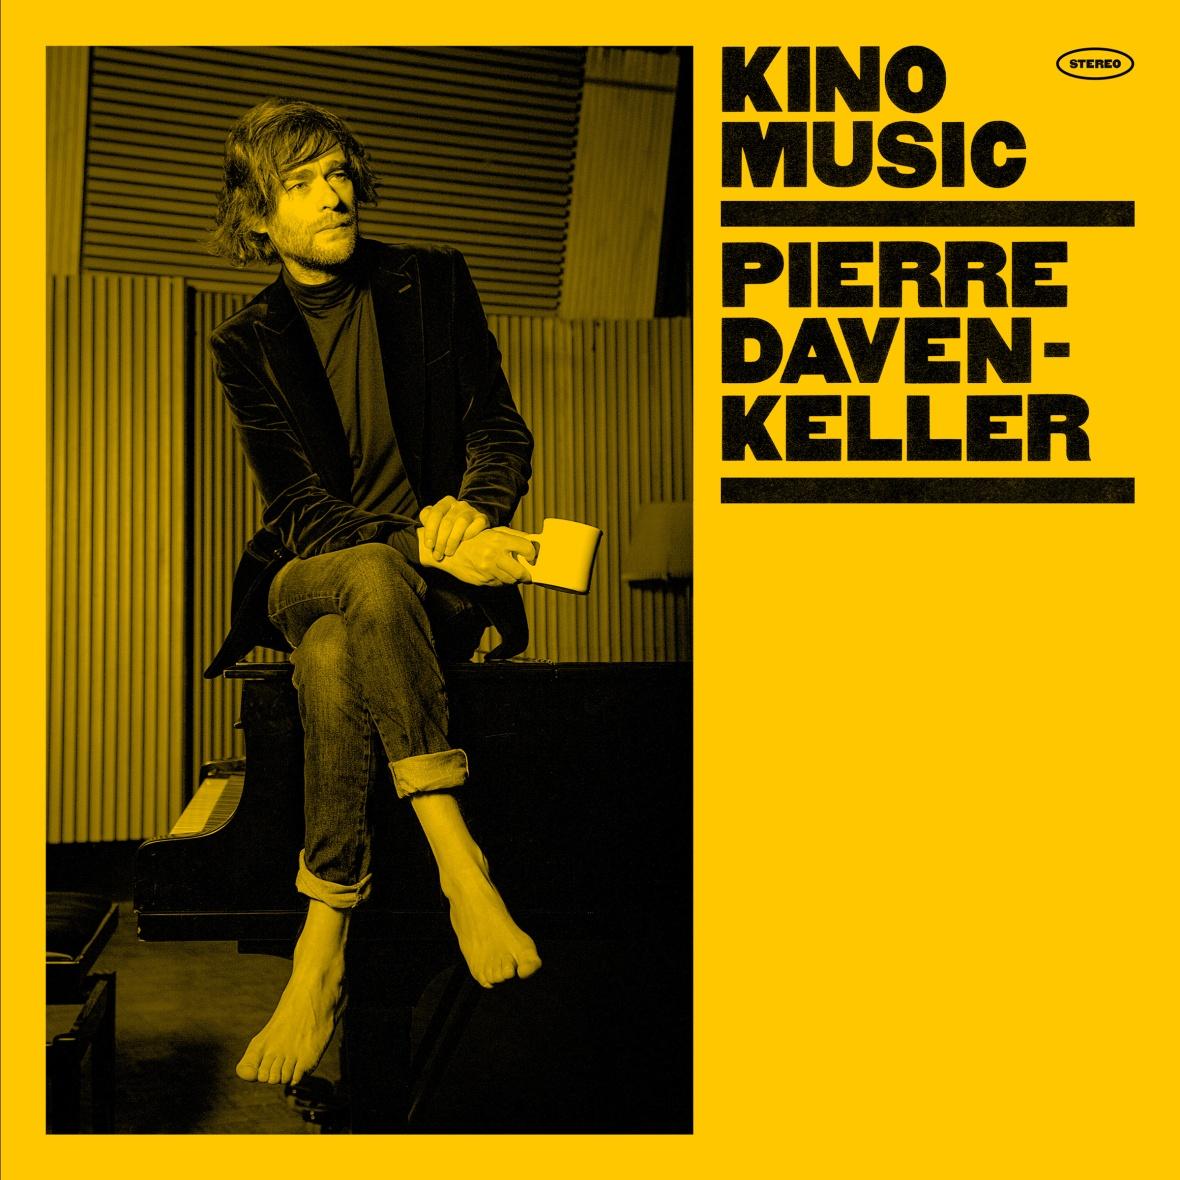 Pierre Daven-Keller - Kino Music